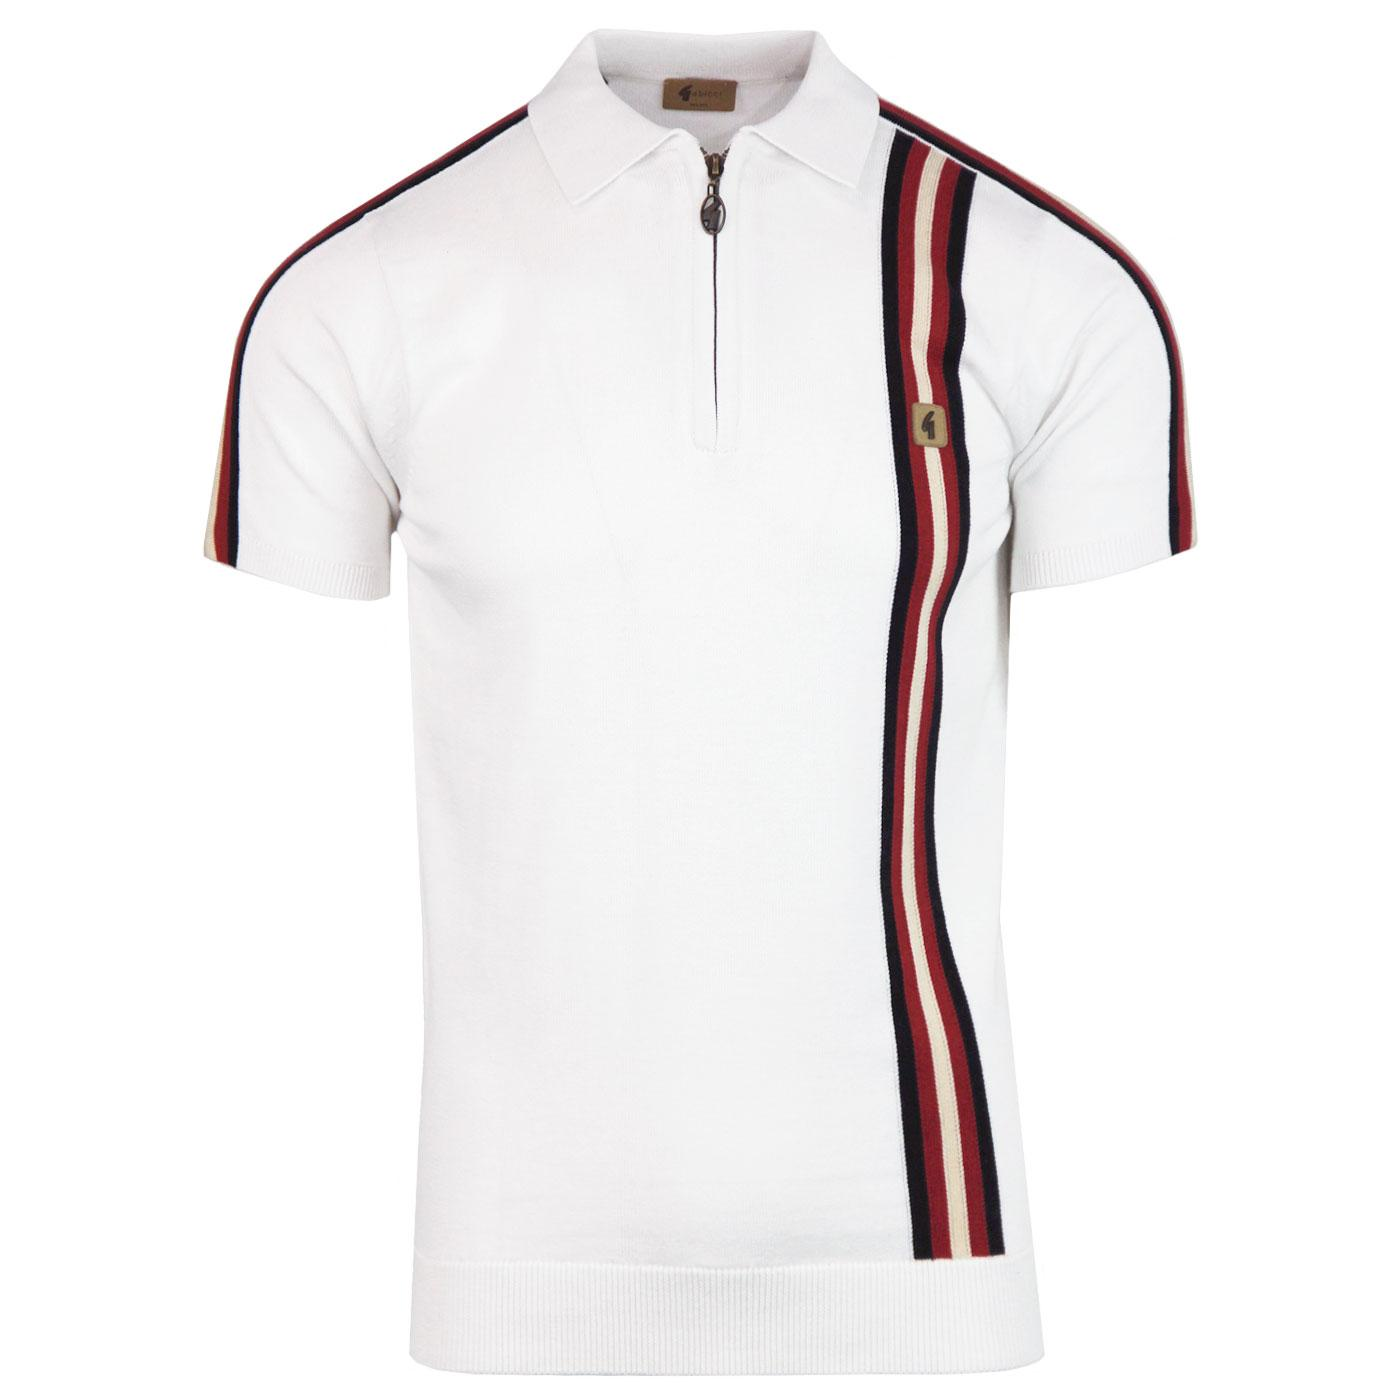 Langton GABICCI VINTAGE Mod Zip Neck Polo Shirt